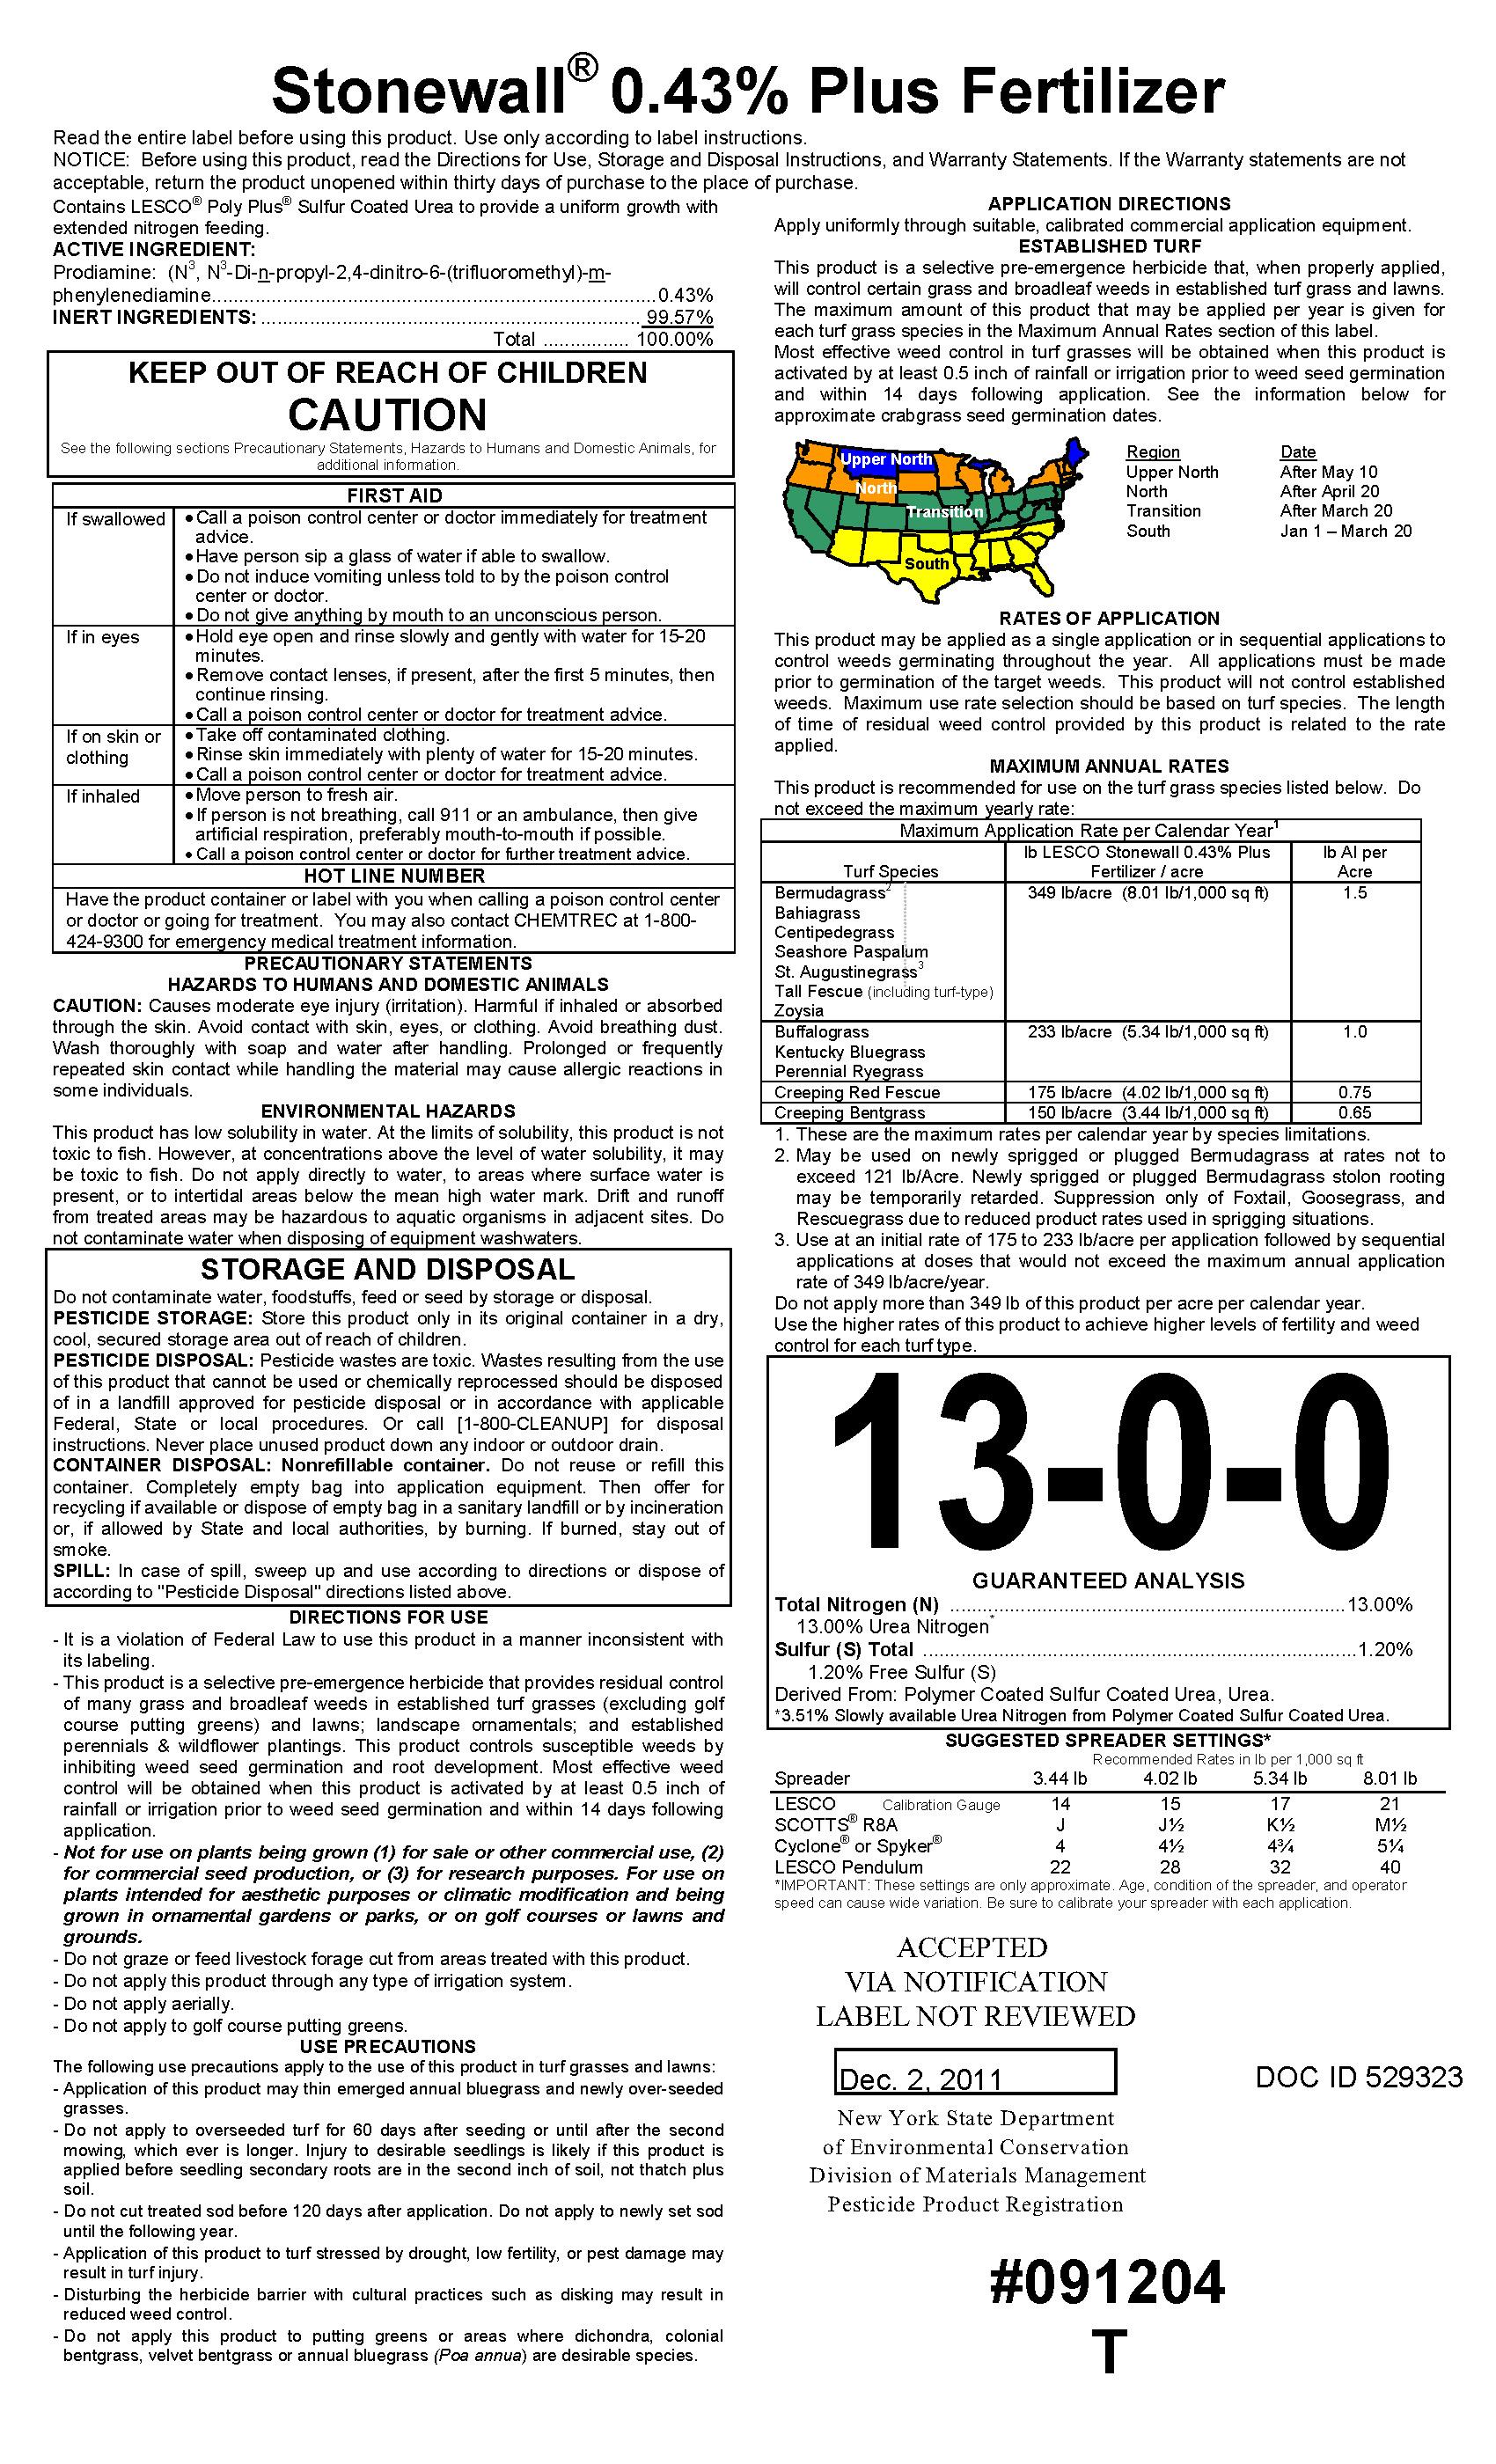 529323 Stonewall NYSPAD 2011_Page_1.jpg